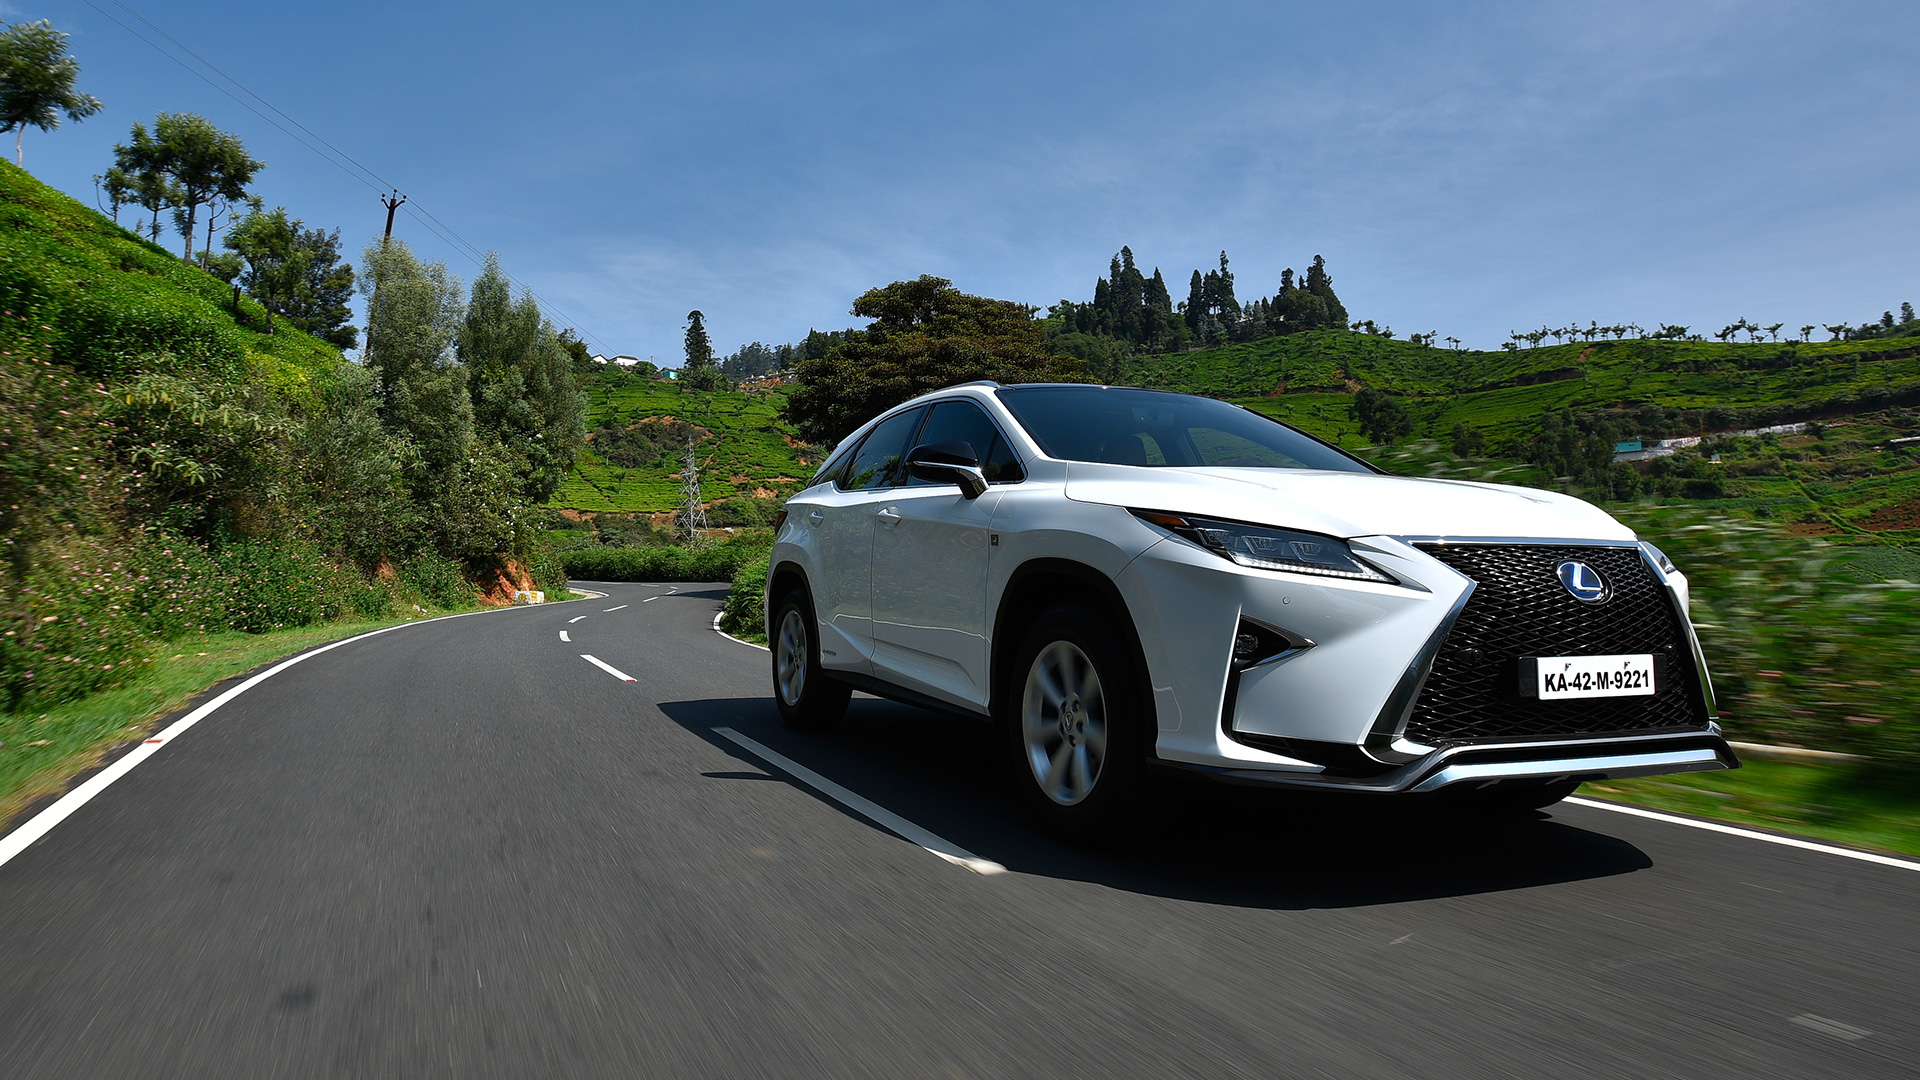 Lexus rx450h 3.5 cvt premium + (05.2012 - 12.2015) - технические характеристики